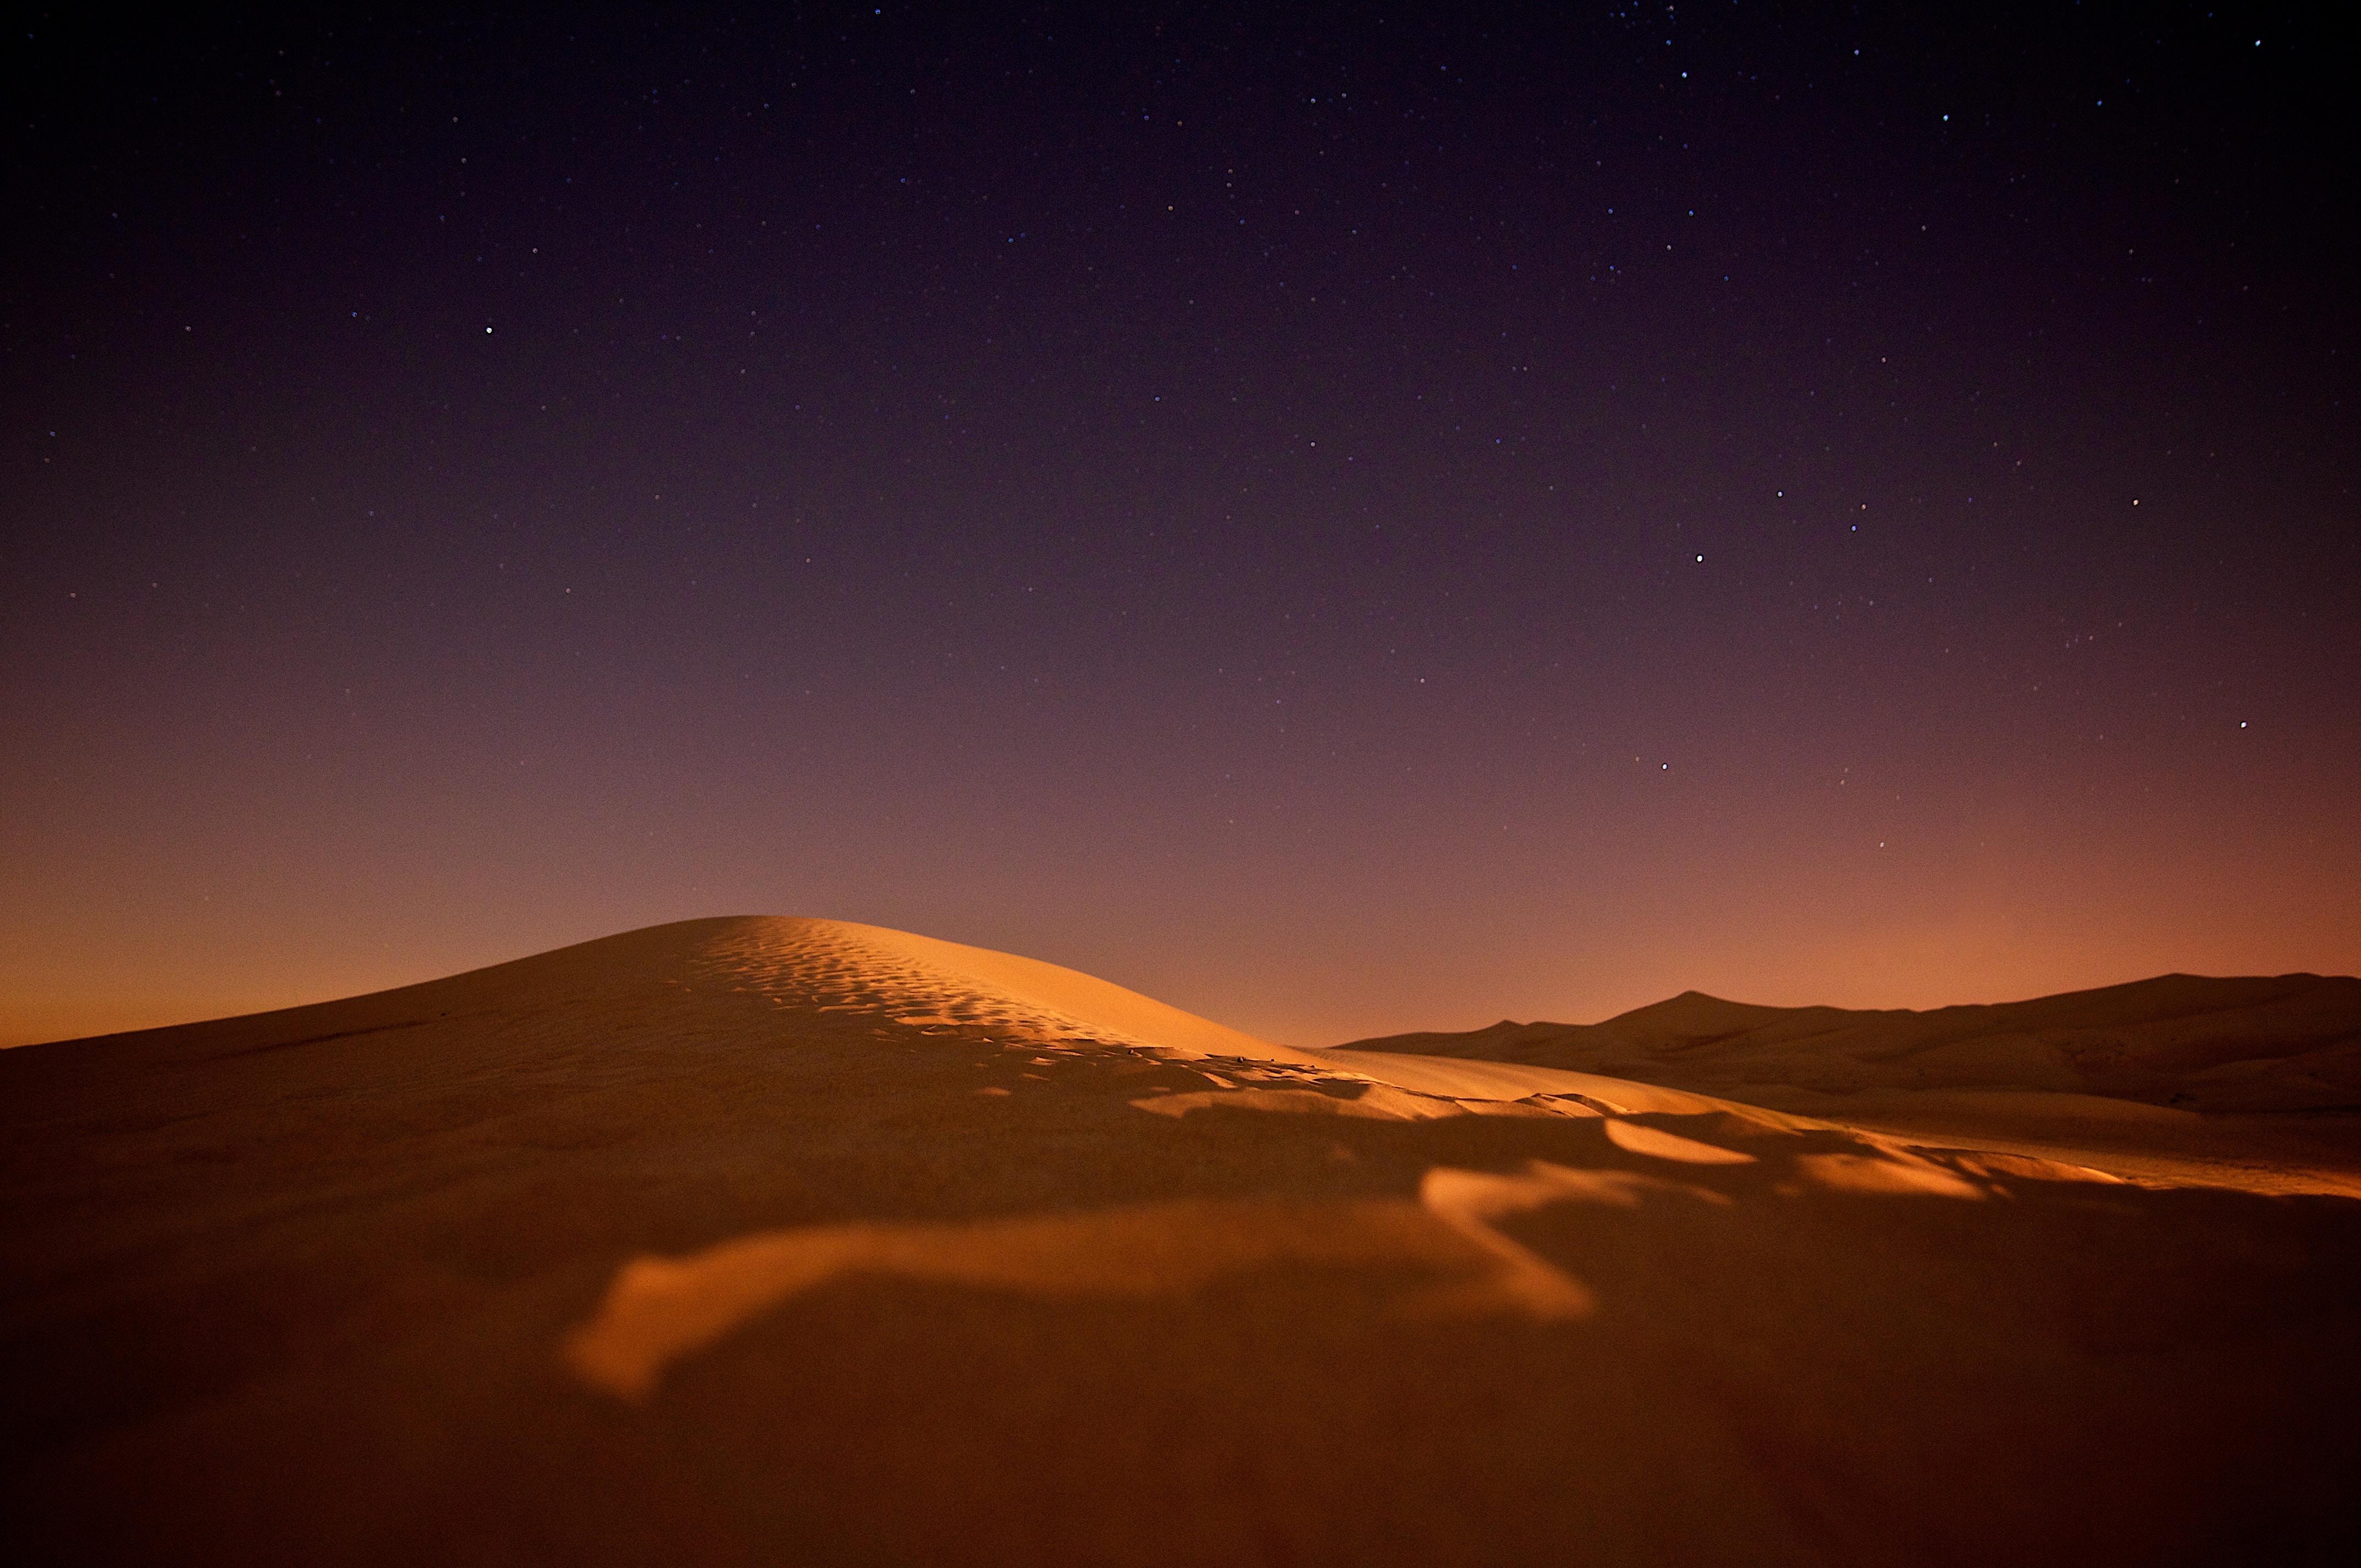 Desert Twilight 4k, HD Nature, 4k Wallpapers, Images ...